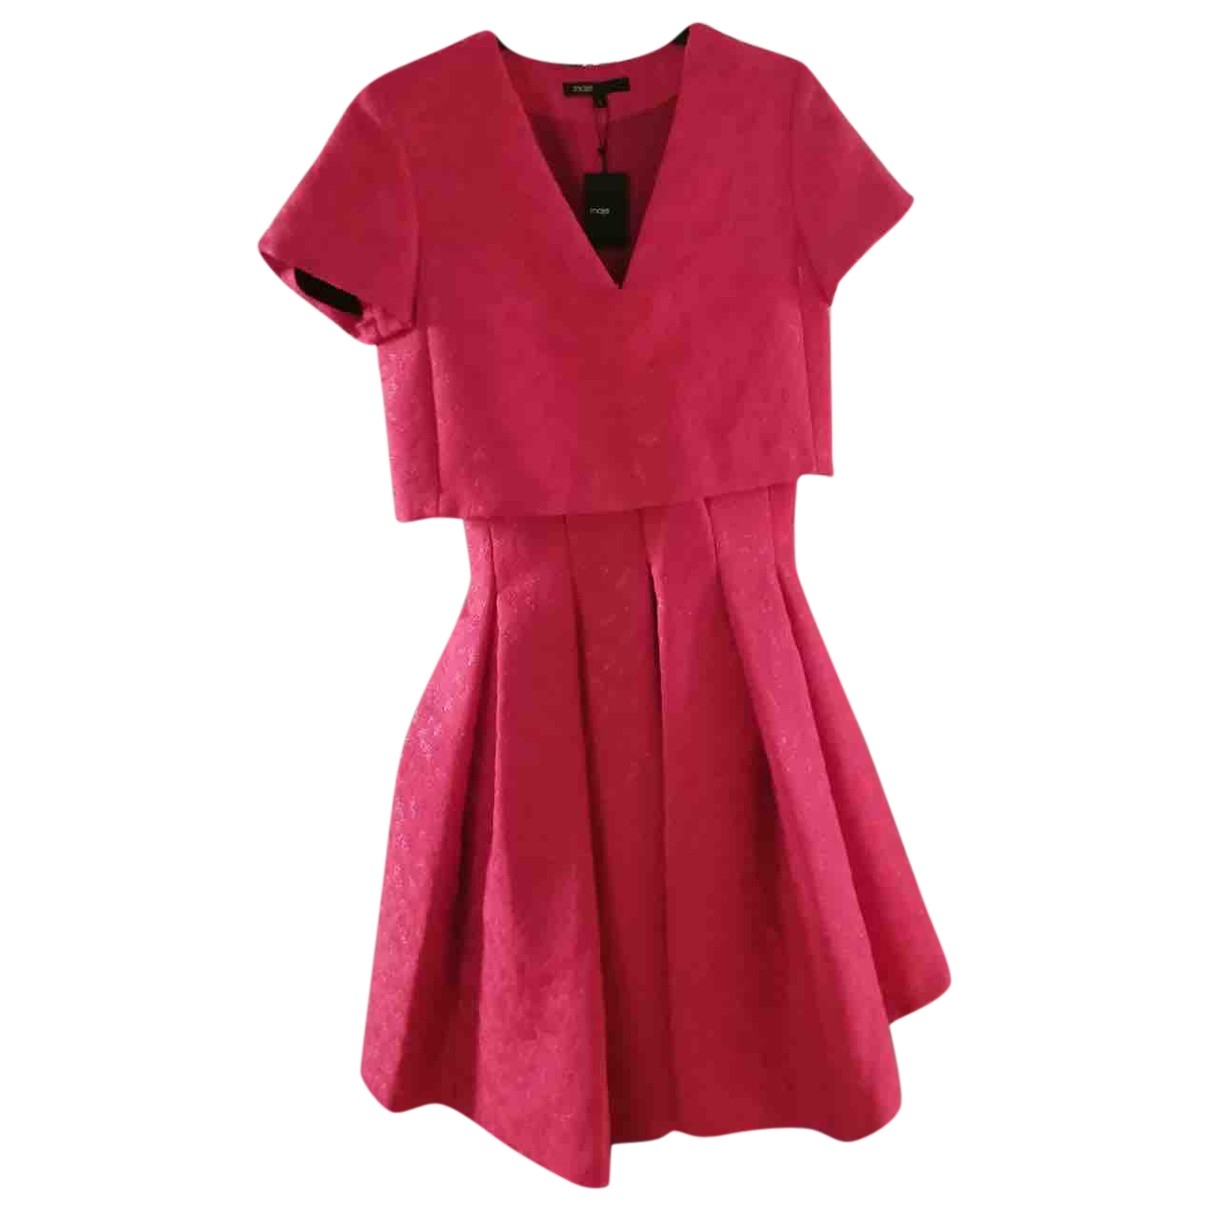 Maje \N Red dress for Women 34 FR